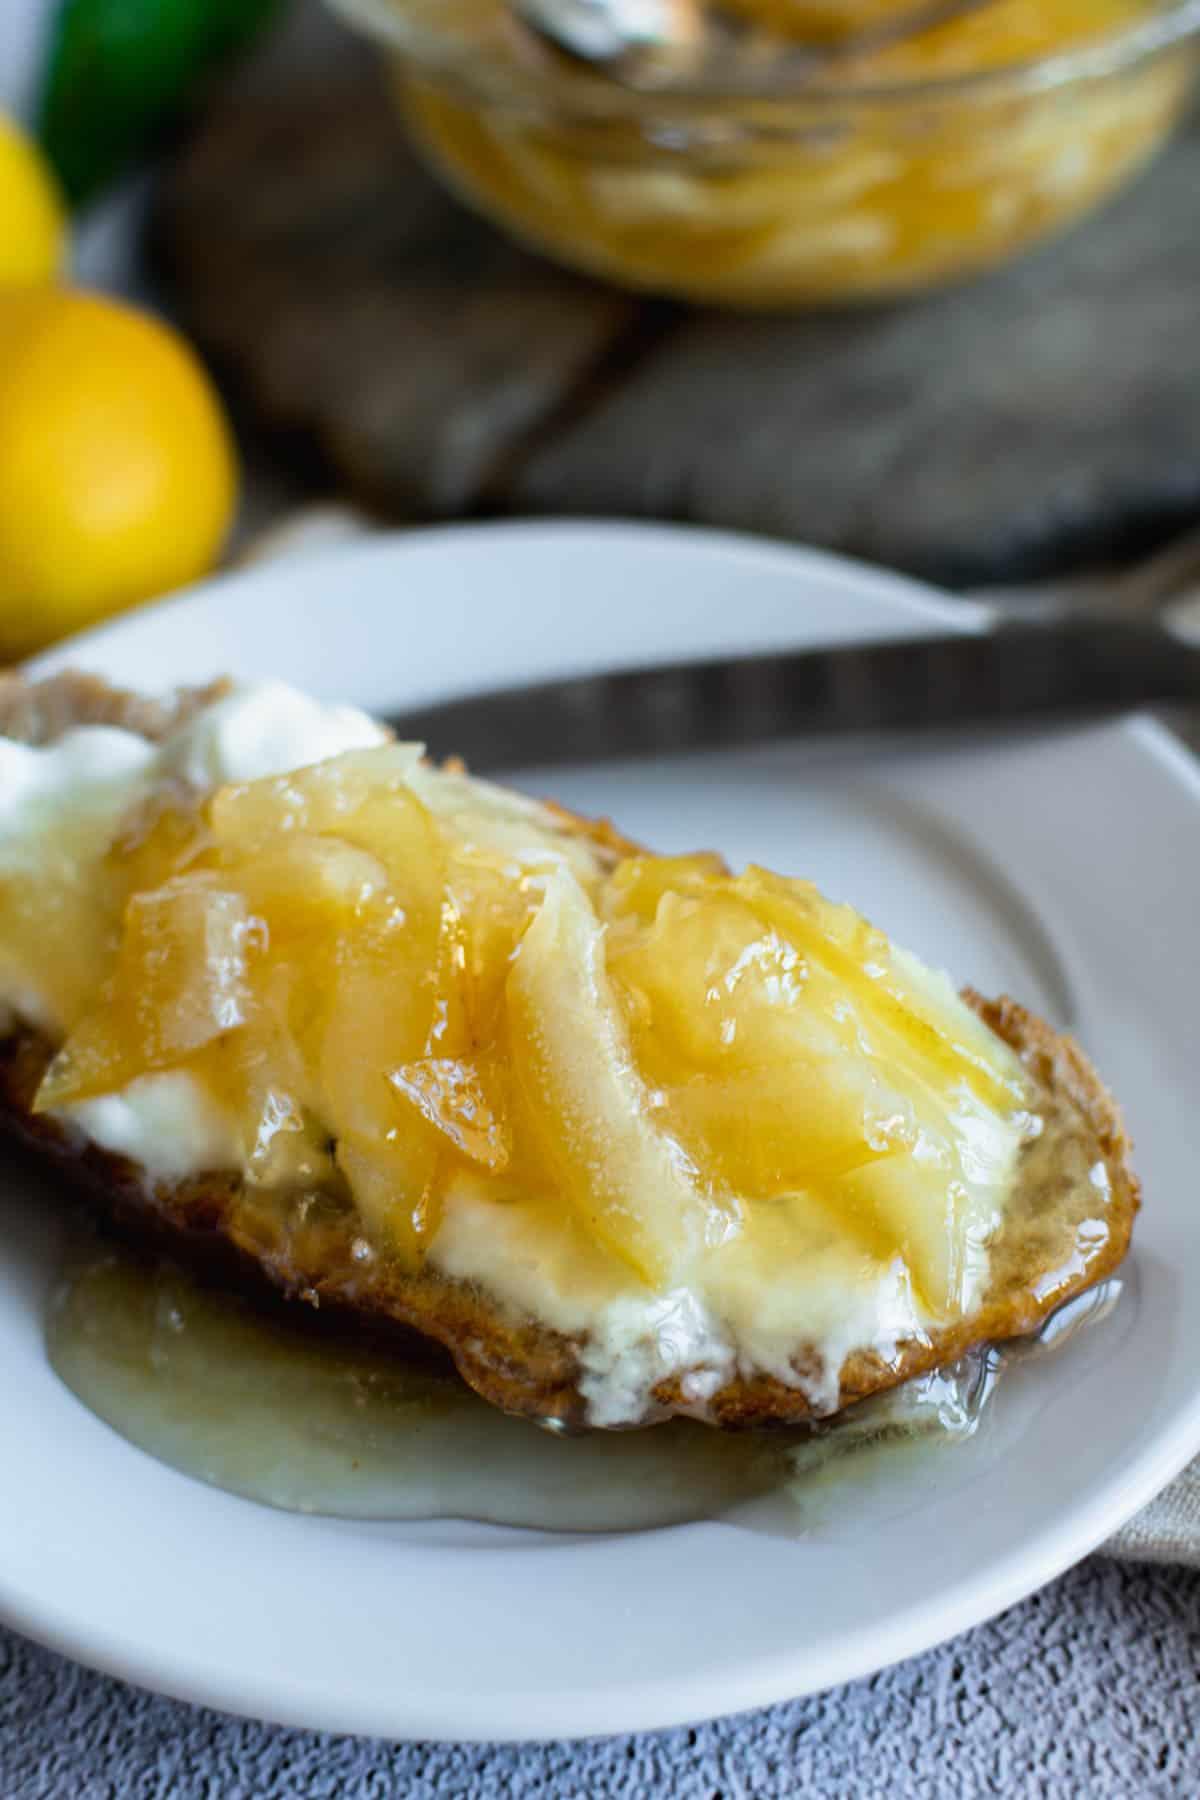 Lemon Jam No Pectin